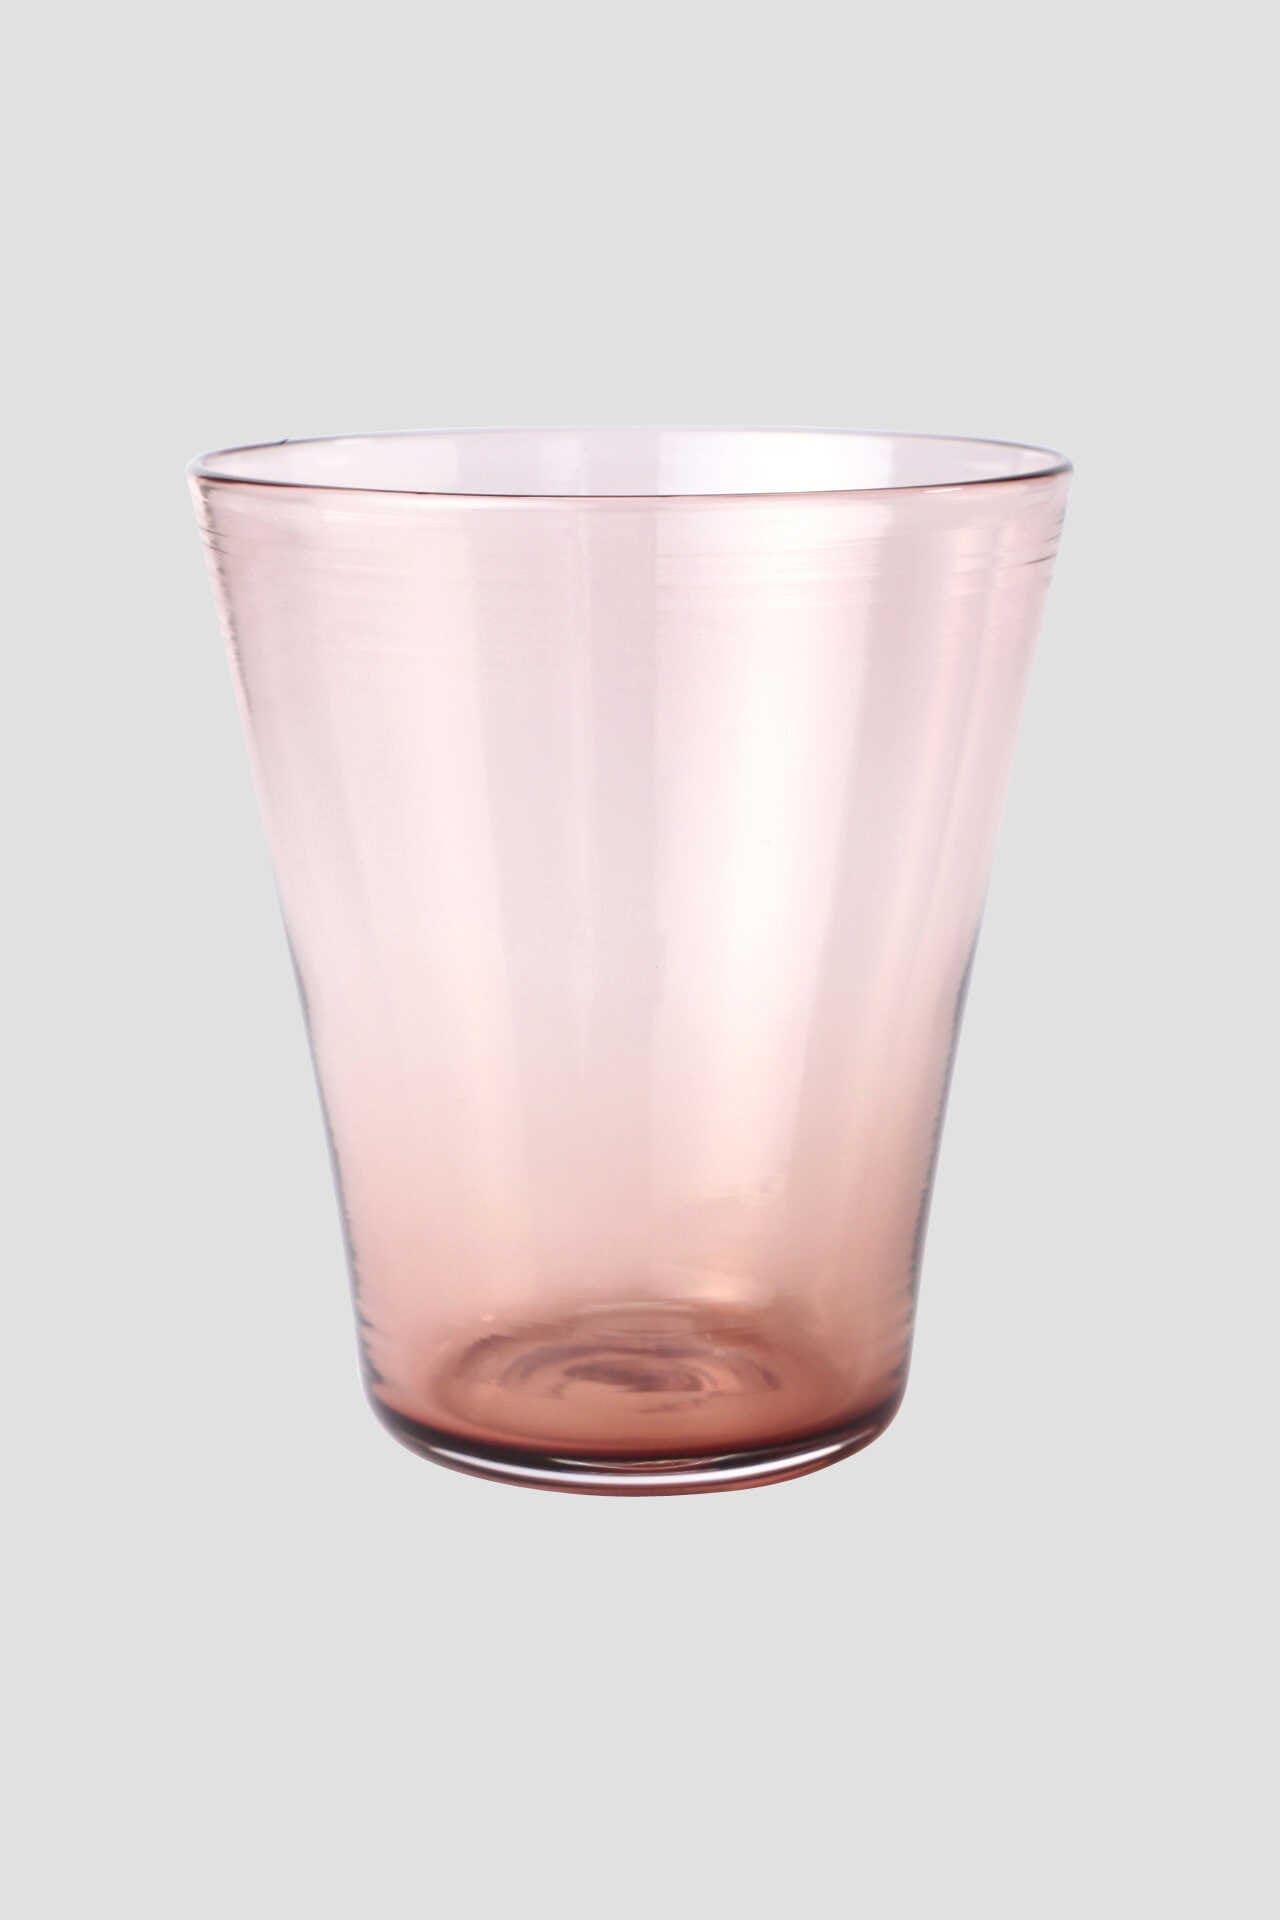 BLOWN GLASS WATER TUMBLER5